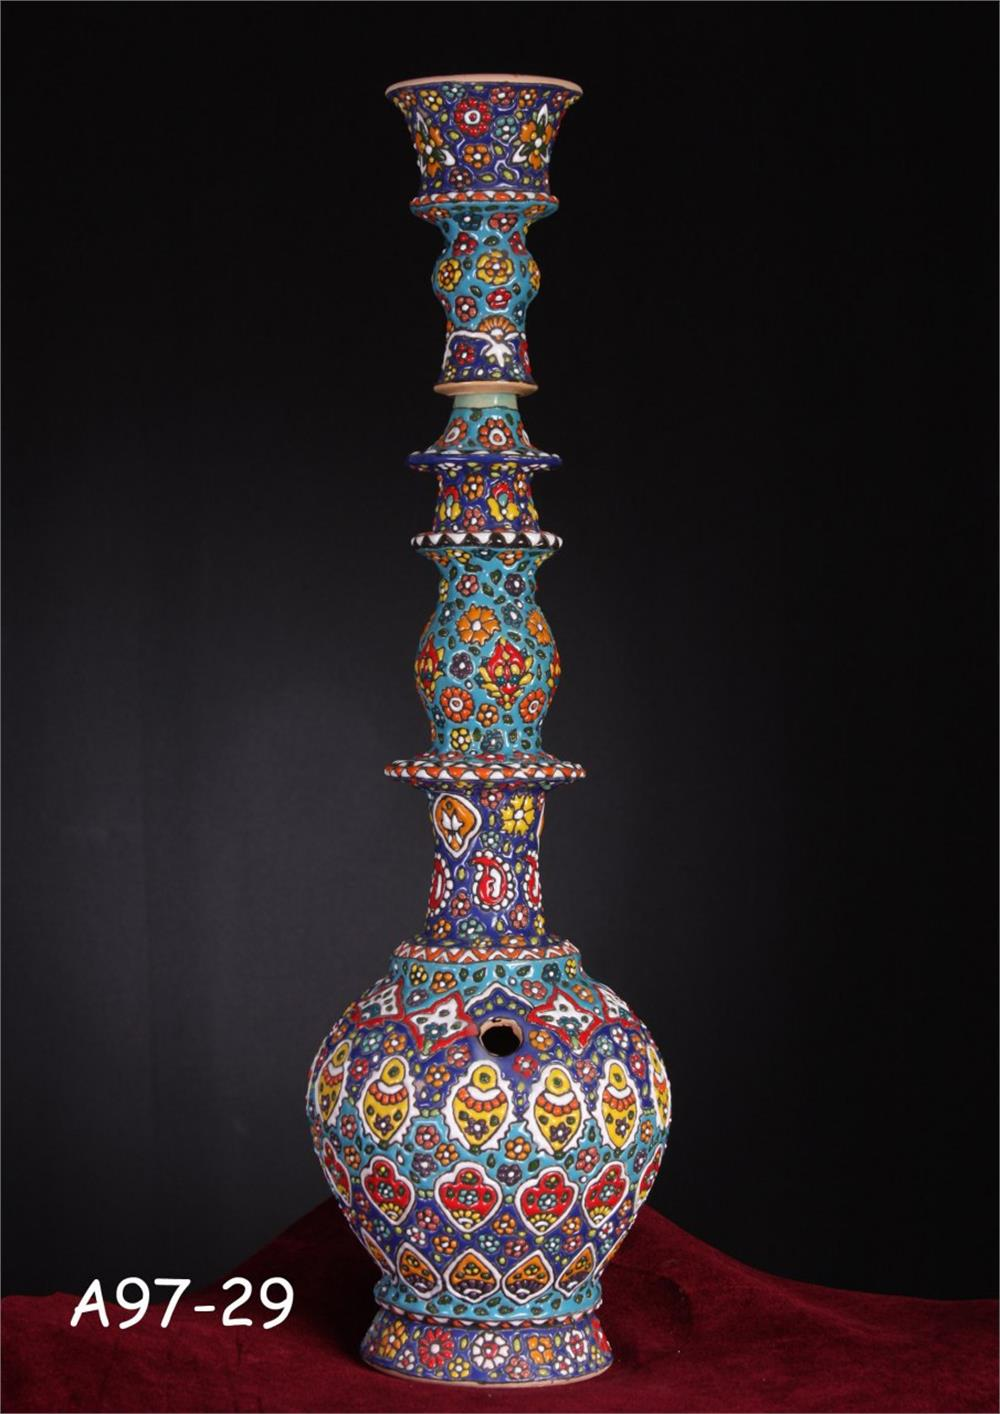 تصویر قلیان کد 702-هنر زیبای سفال همدان با شهرت جهانی Hookah Code 702-Beautiful art of Hamedan pottery with world fame